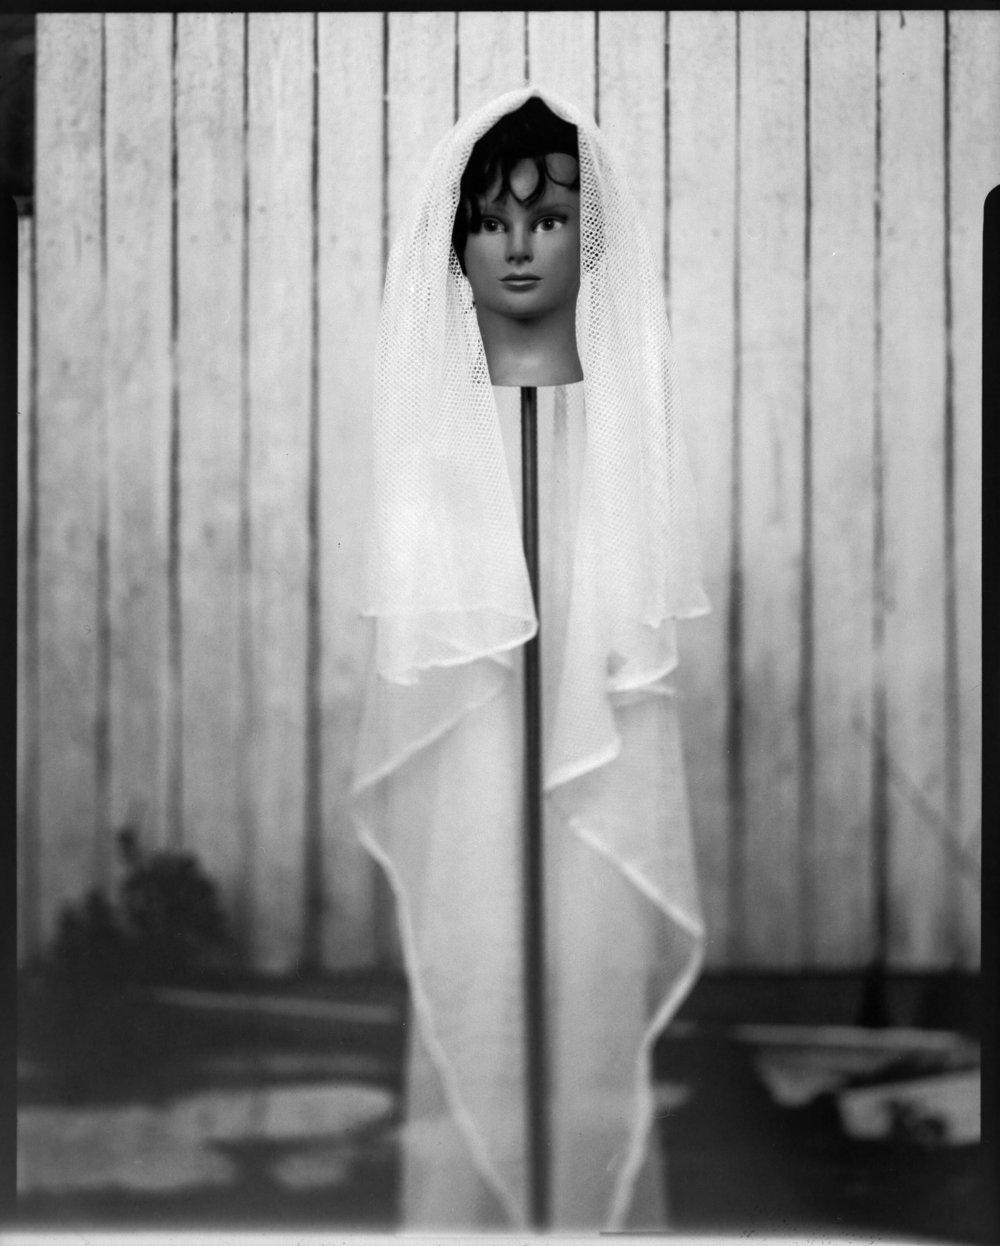 C.L. Svendsen | untitled | chamonix 45 f2 240mm | paper negative